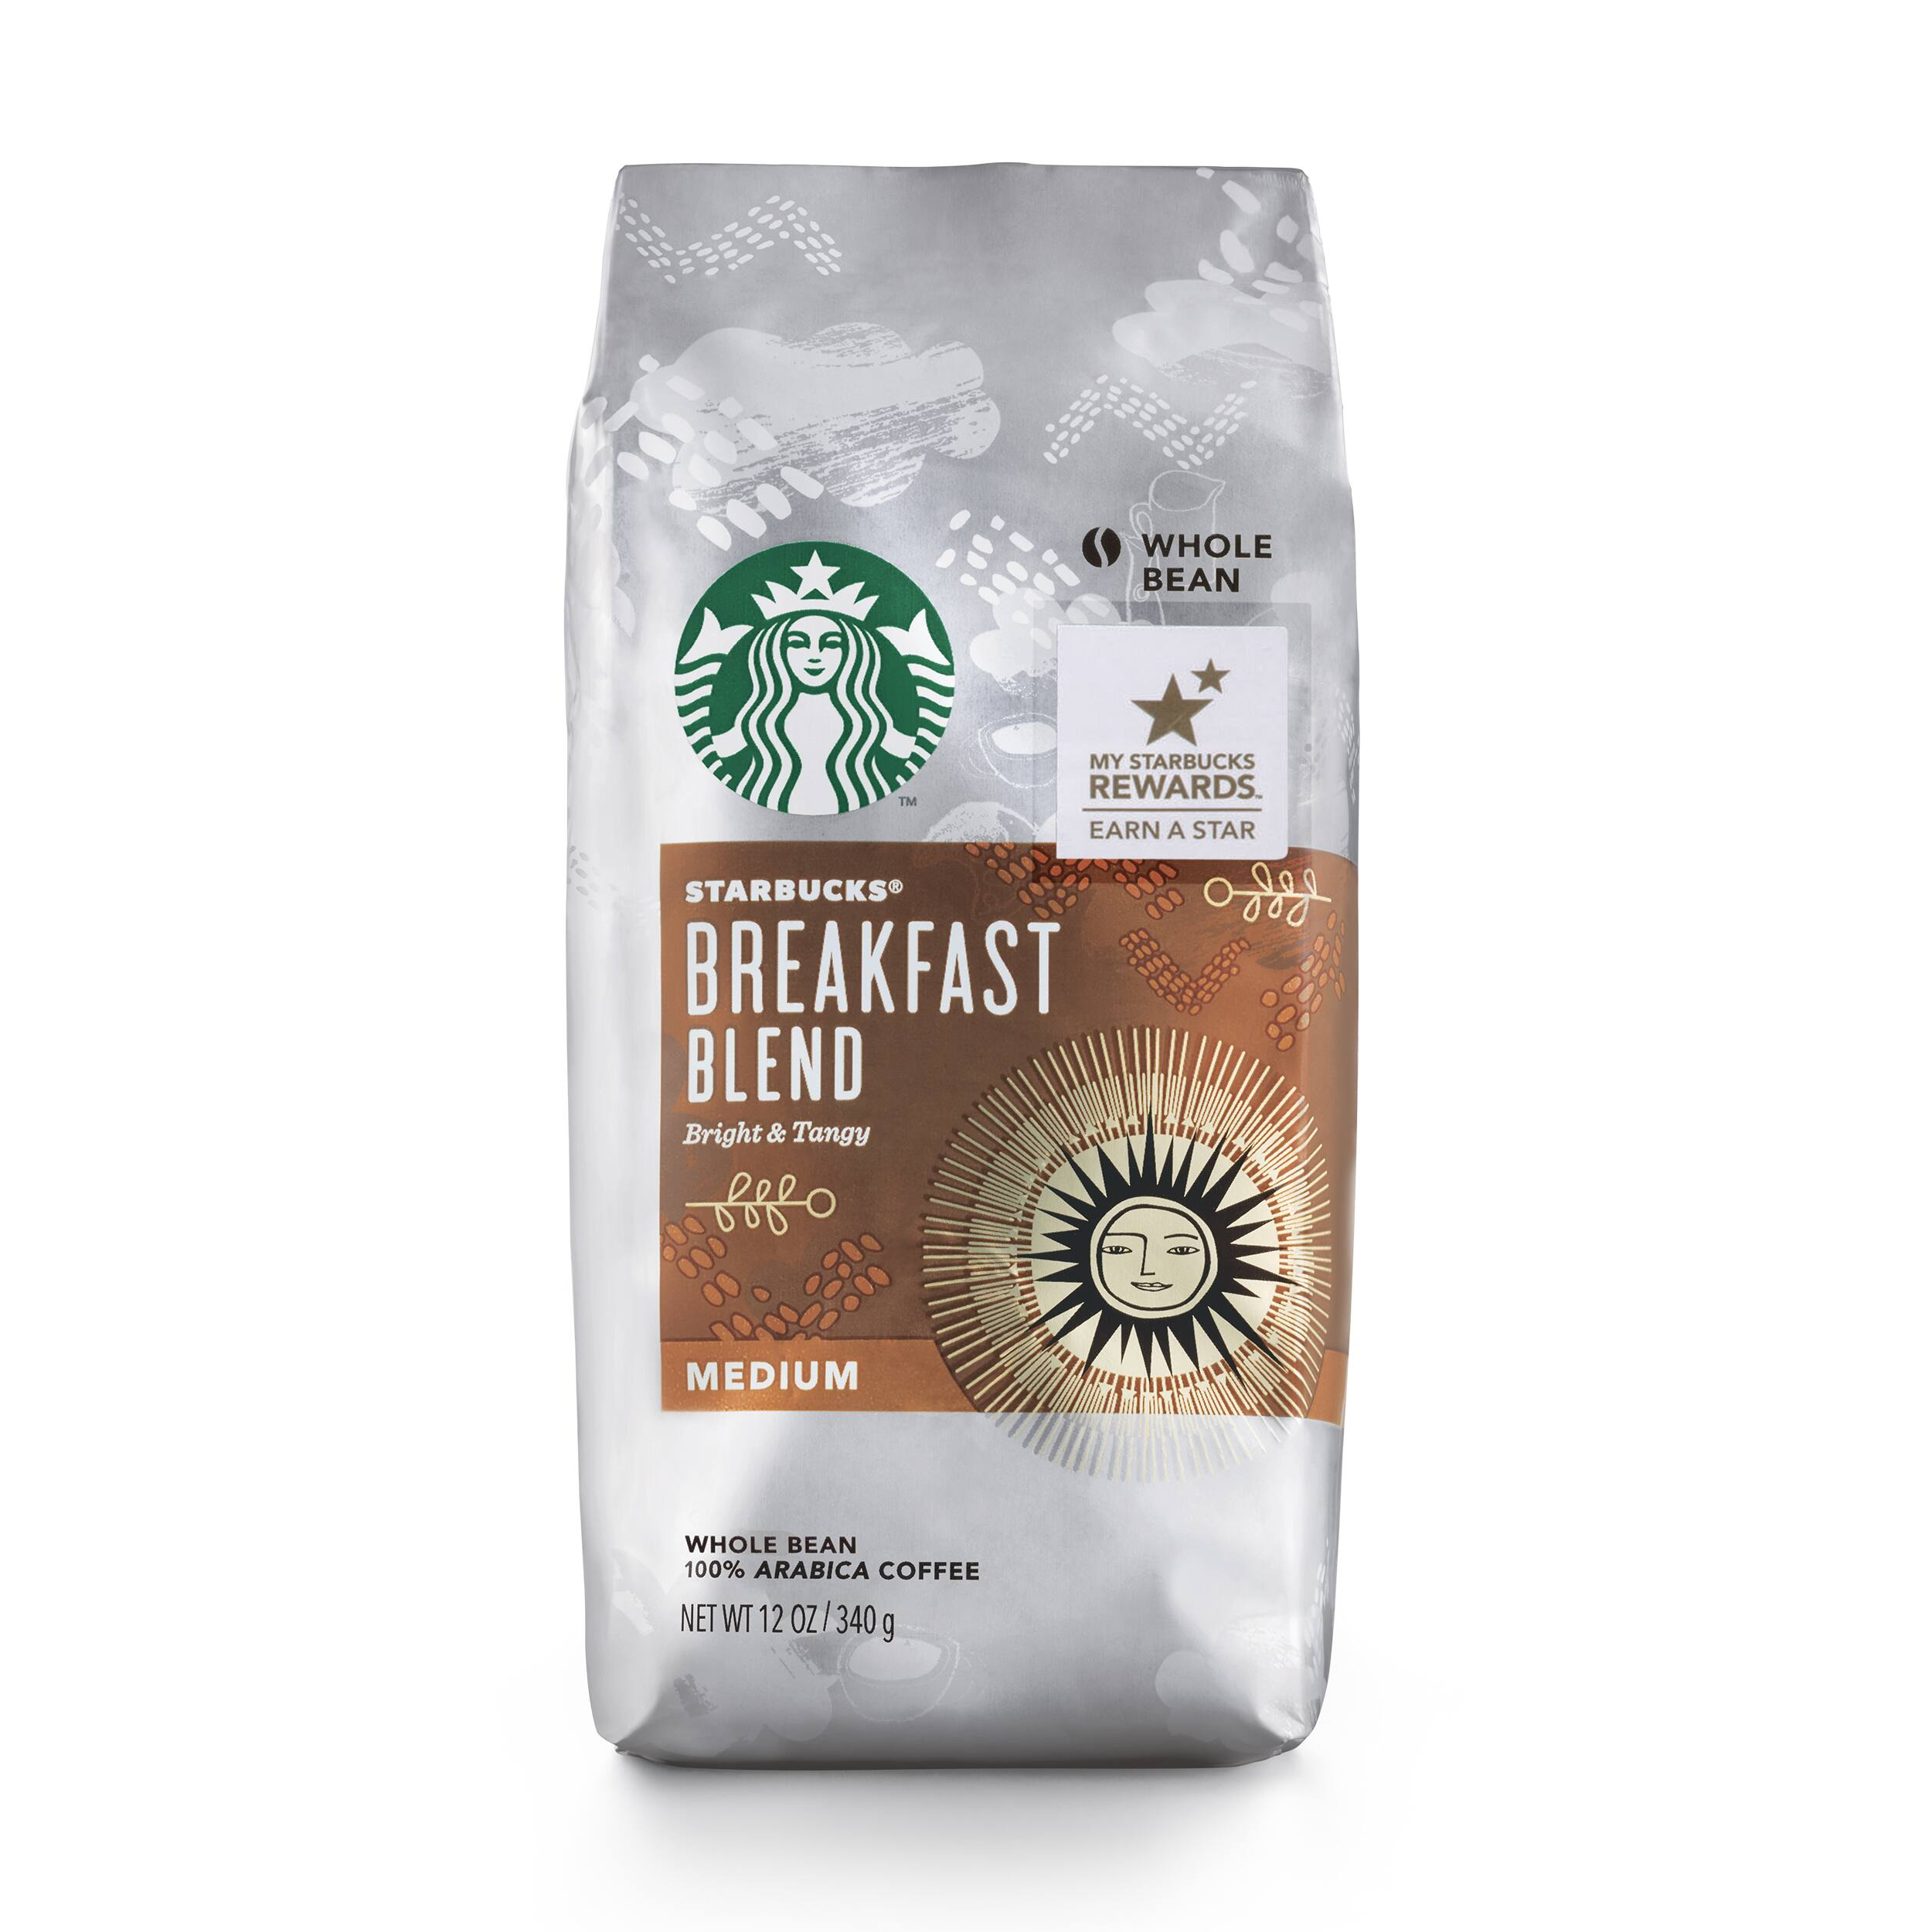 Target Cartwheel: 3-Count 12oz Starbucks House Blend Medium Roast Whole Bean Coffee $12.80 w/S&S & More + Free Store Pickup